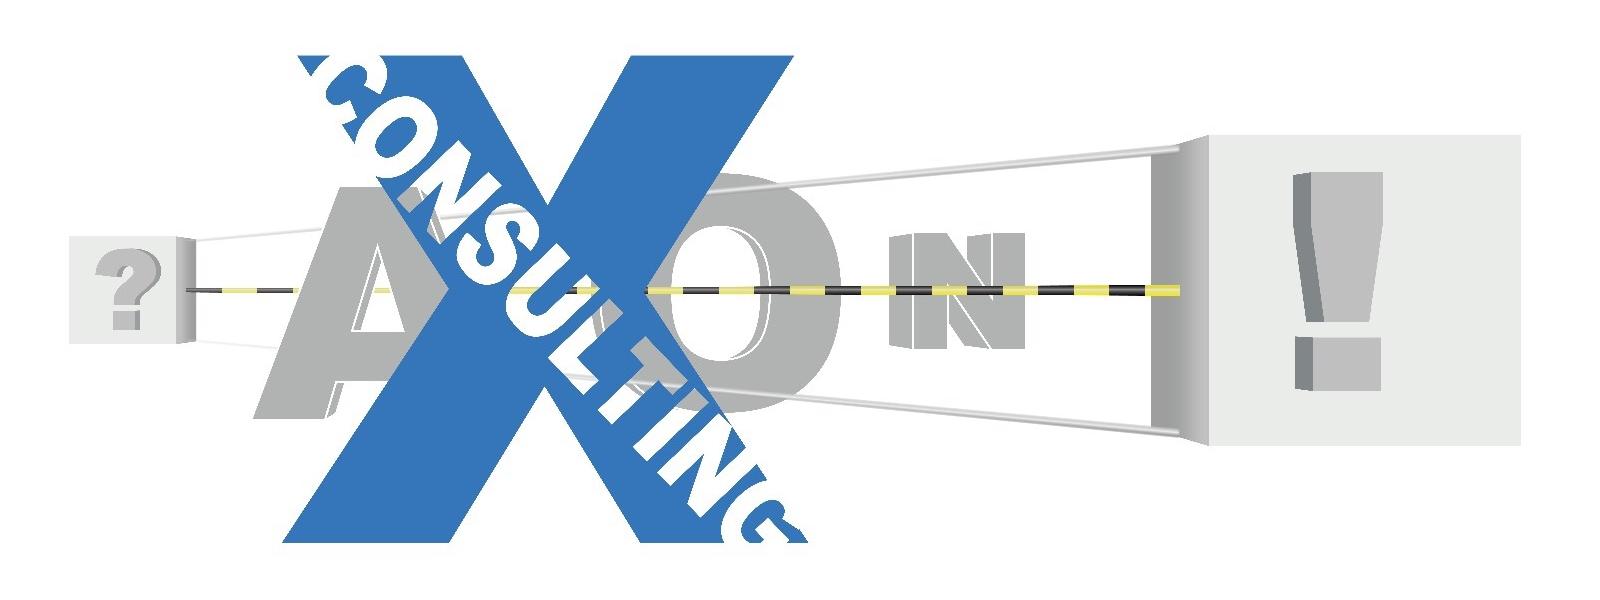 Axon consulting logo